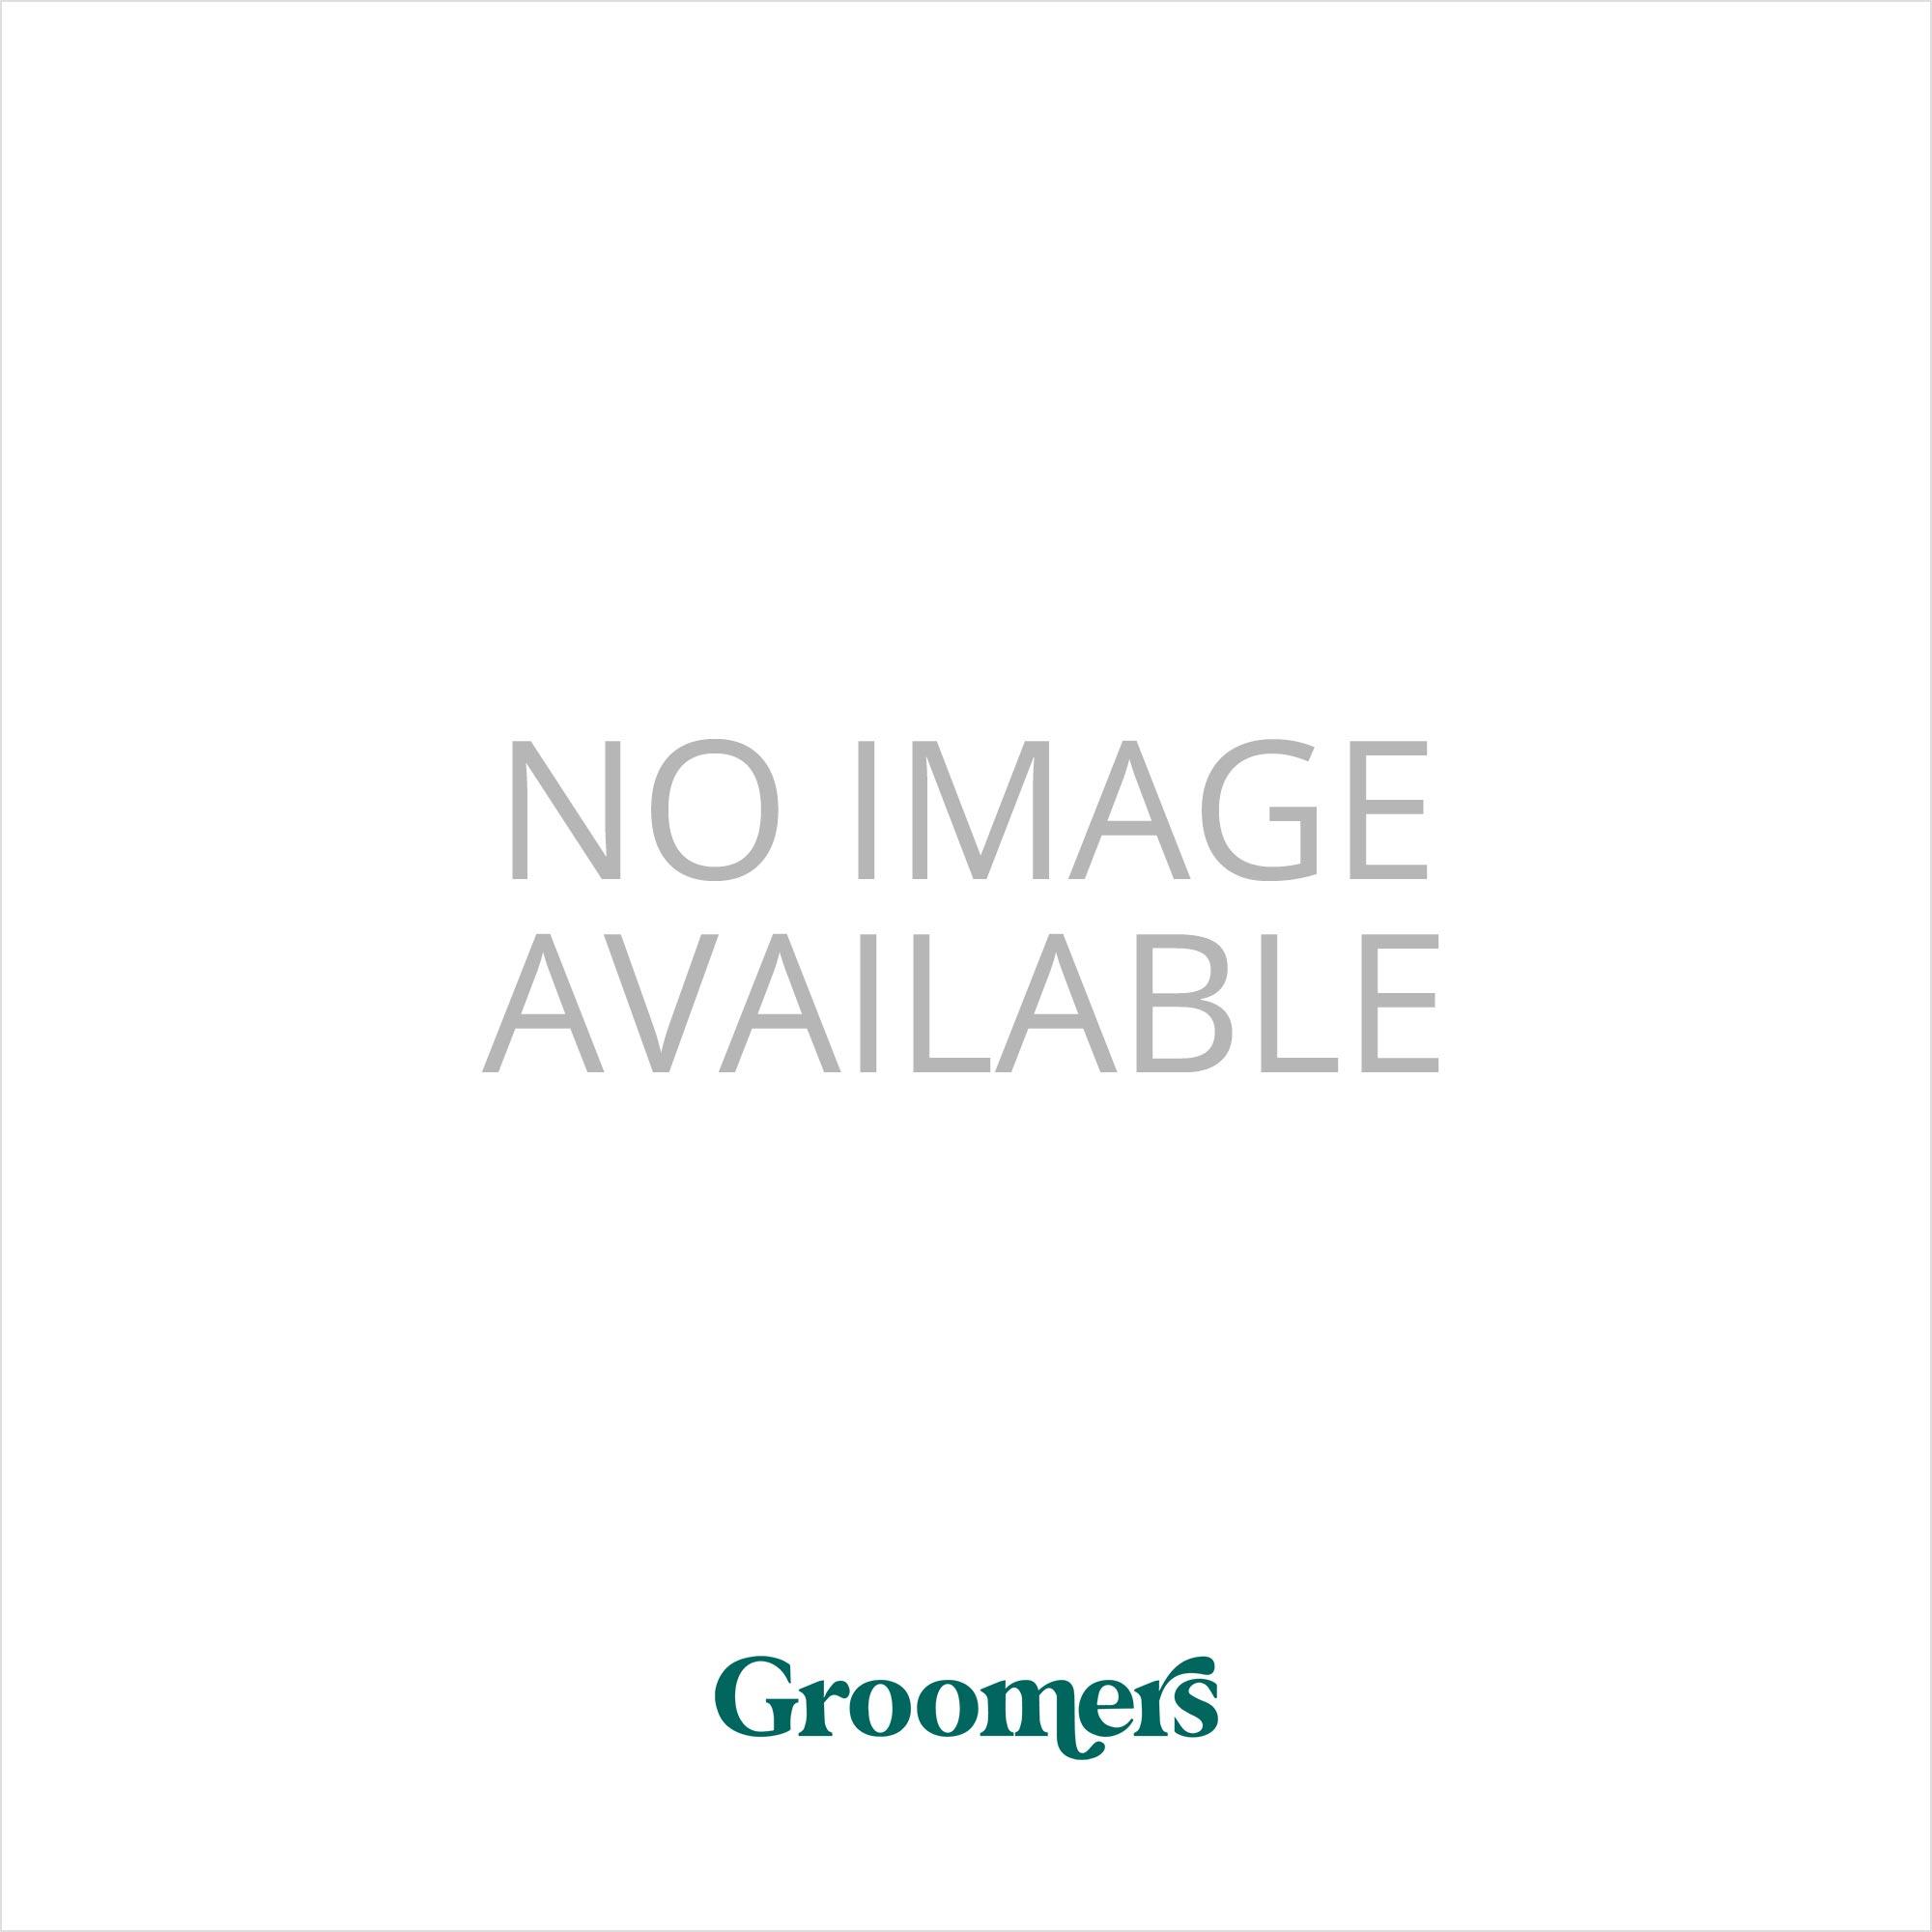 Grooming Artero Beauty Chalk – Black - NEW